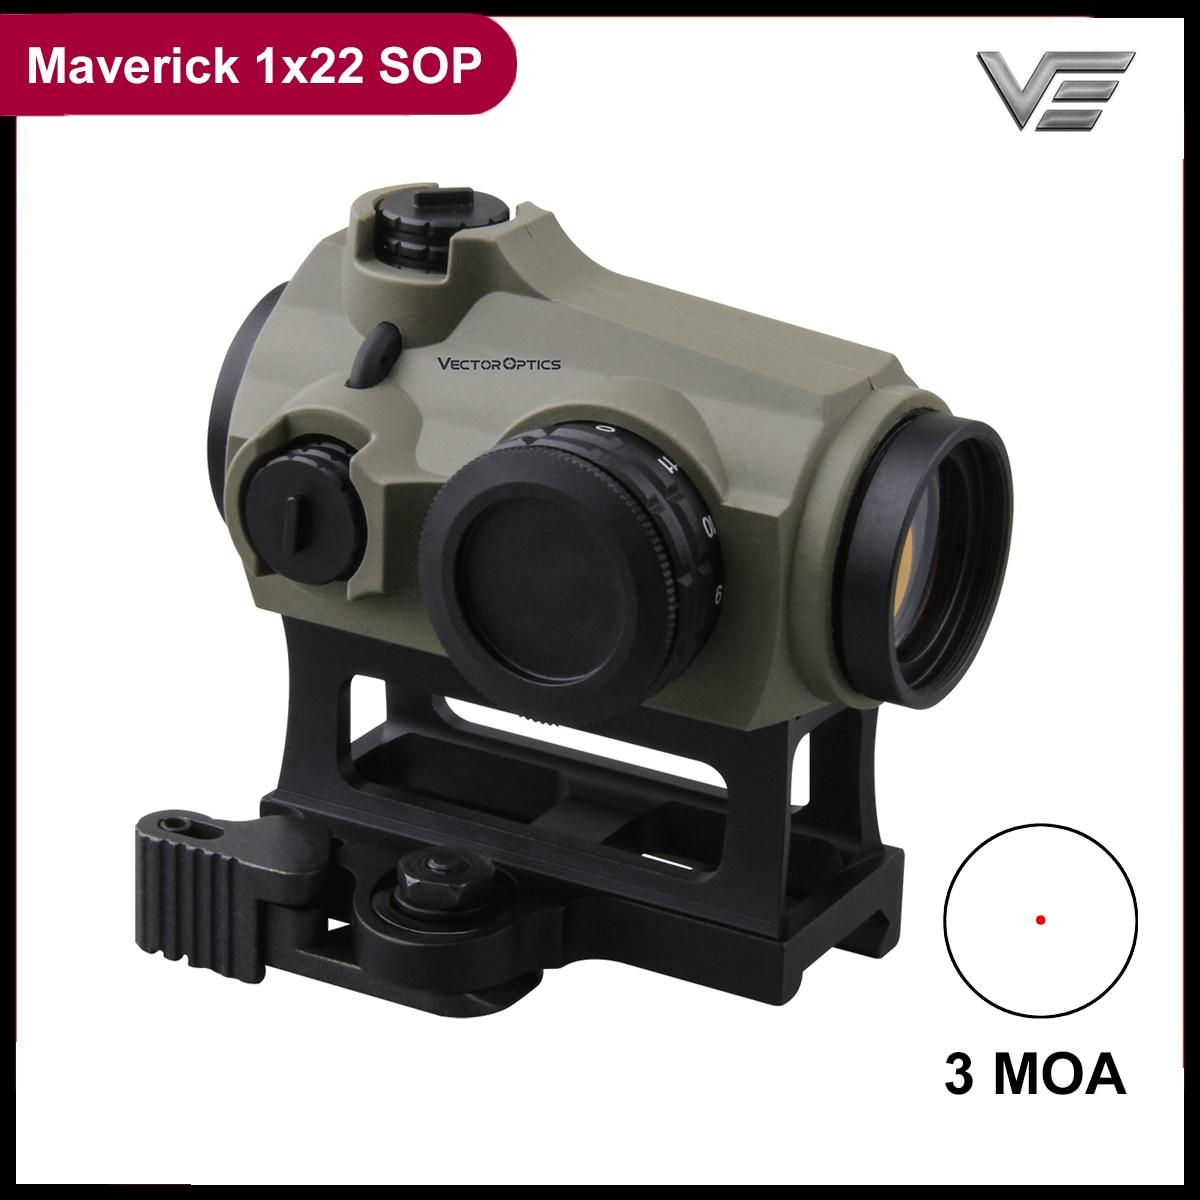 Vektör optik Maverick 1x22 SOP Red Dot kapsam avcılık optik Sight koyu toprak kauçuk kapak 3 MOA IPX6 taktik kapsam QD dağı